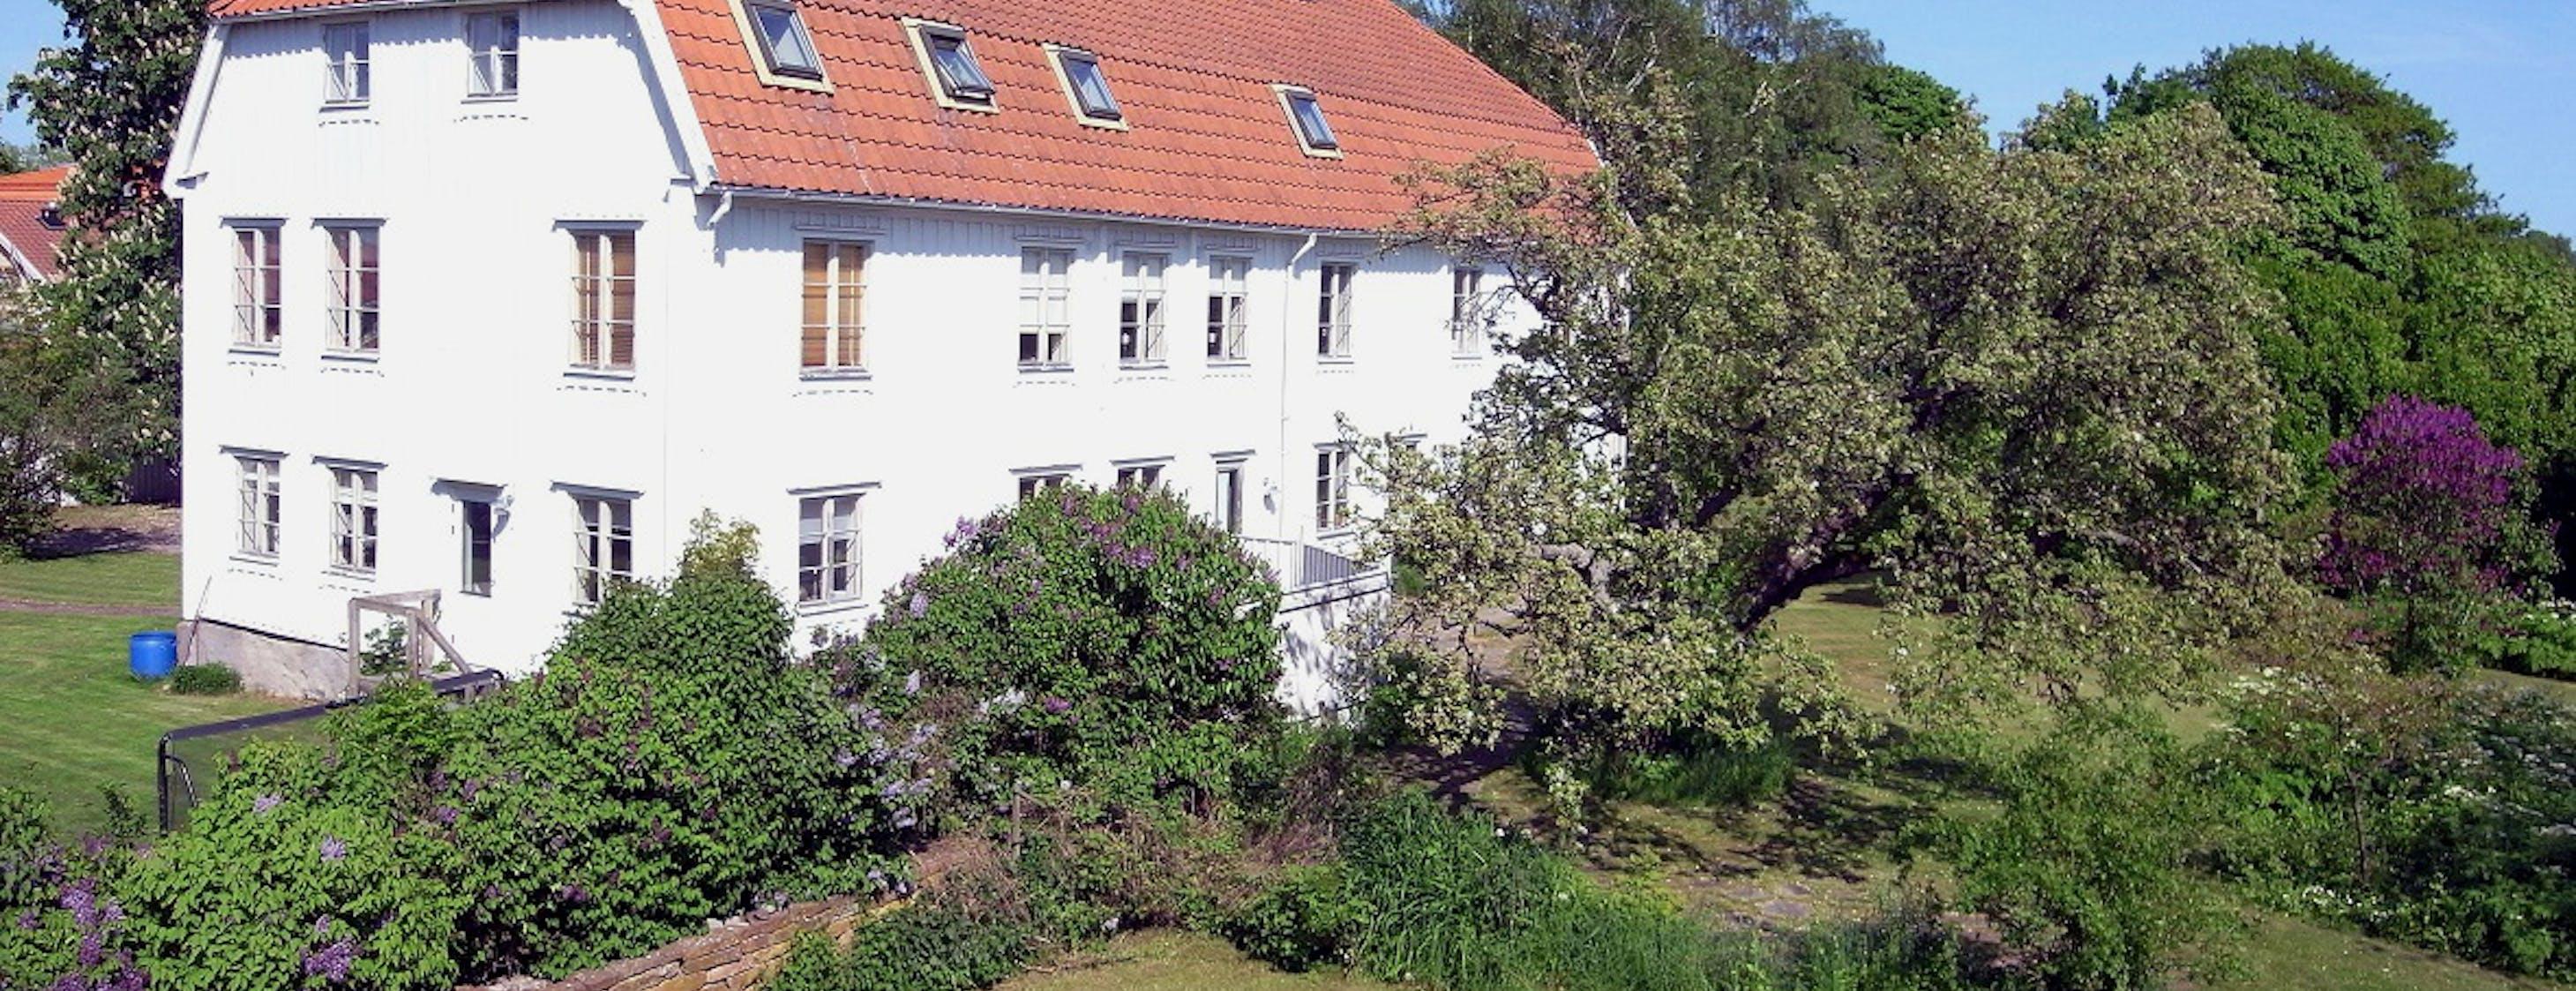 Sjöbergs gata 3 Färjestaden